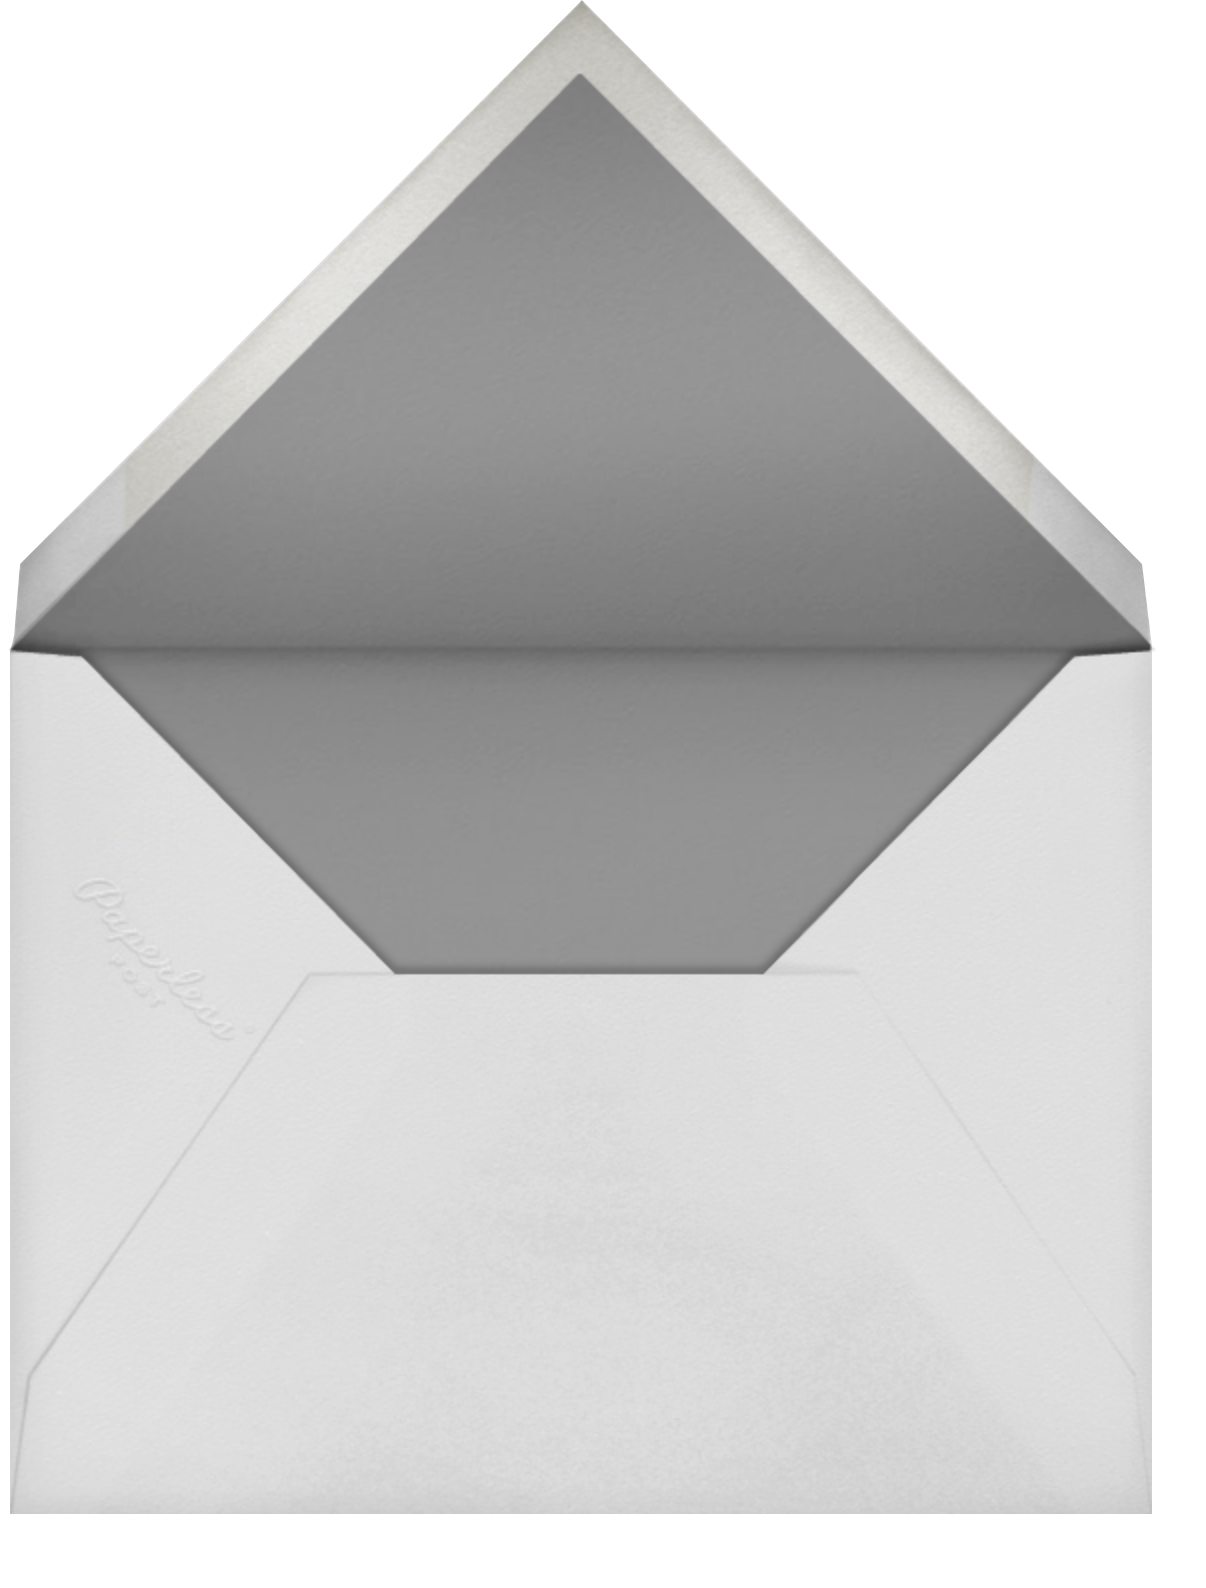 Diva Album - Black - Paperless Post - Envelope